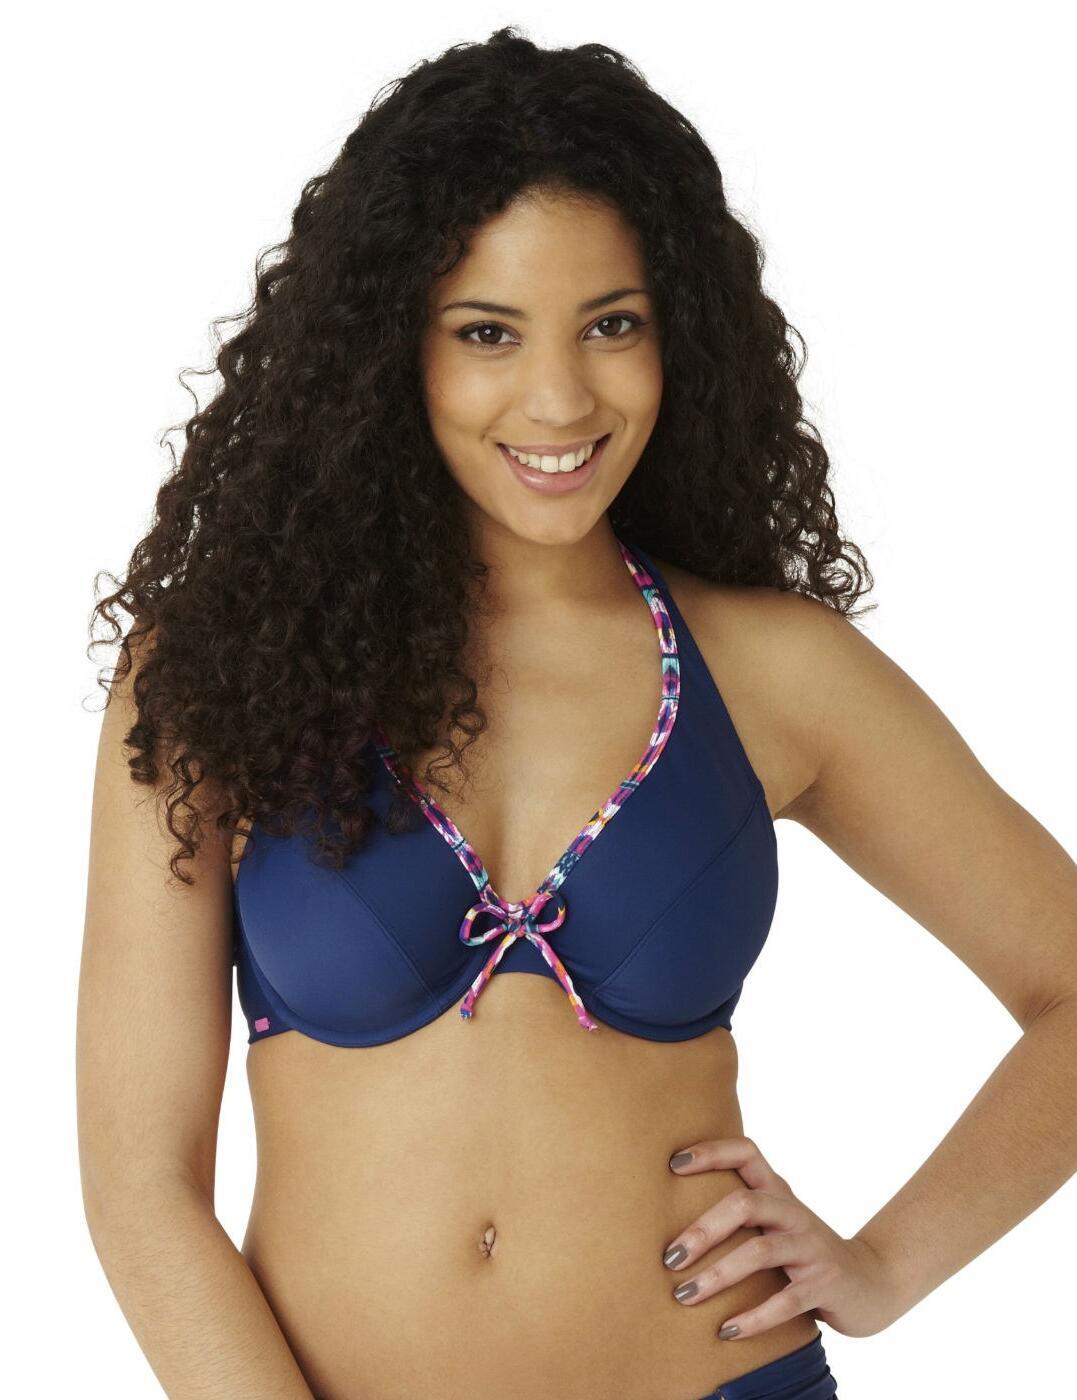 CW0174 Cleo Lexie Halterneck Bikini Top Ikat Print - CW0174 Halter Bikini Top